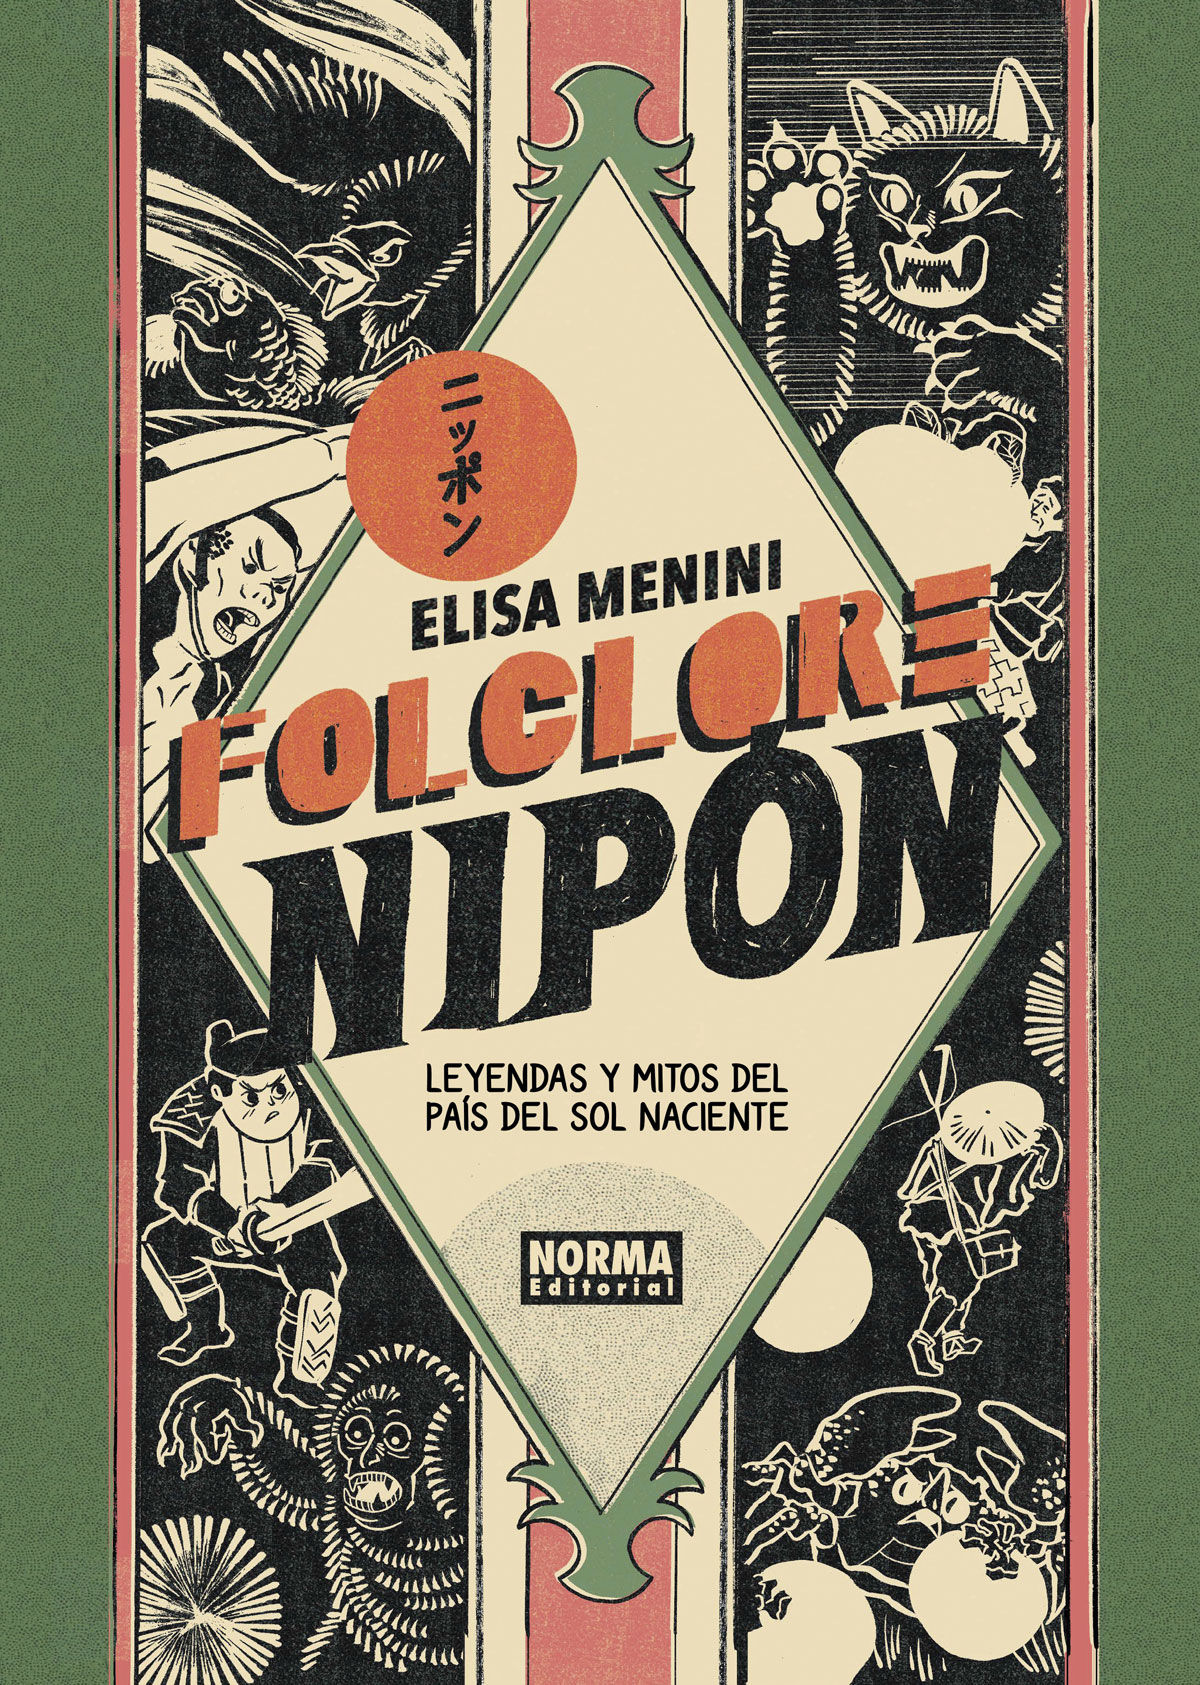 FOLCLORE NIPON